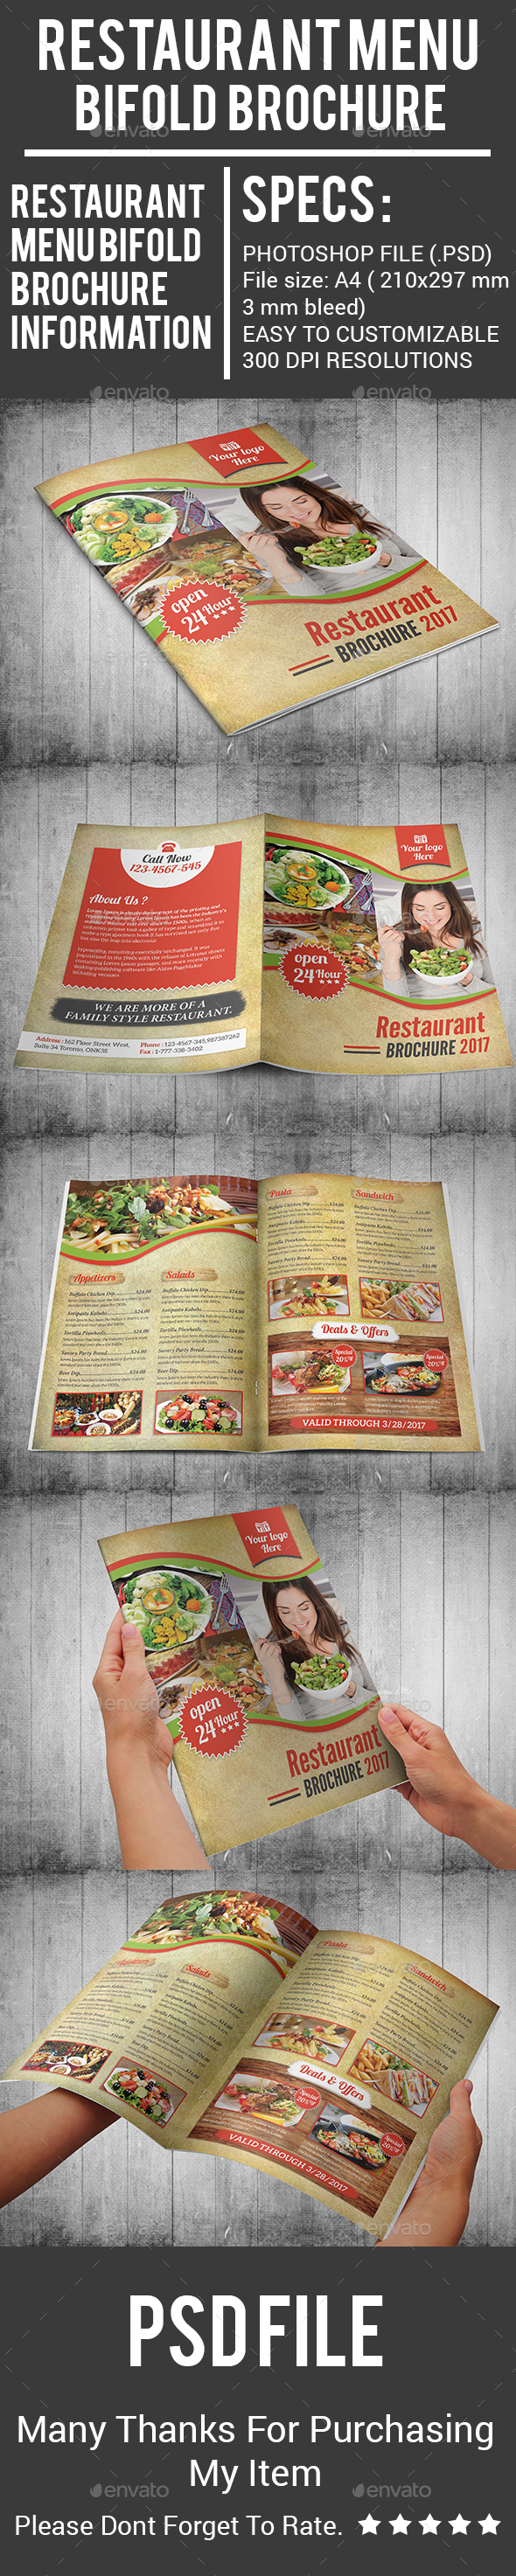 Restaurant Menu Bifold Brochure - Food Menus Print Templates